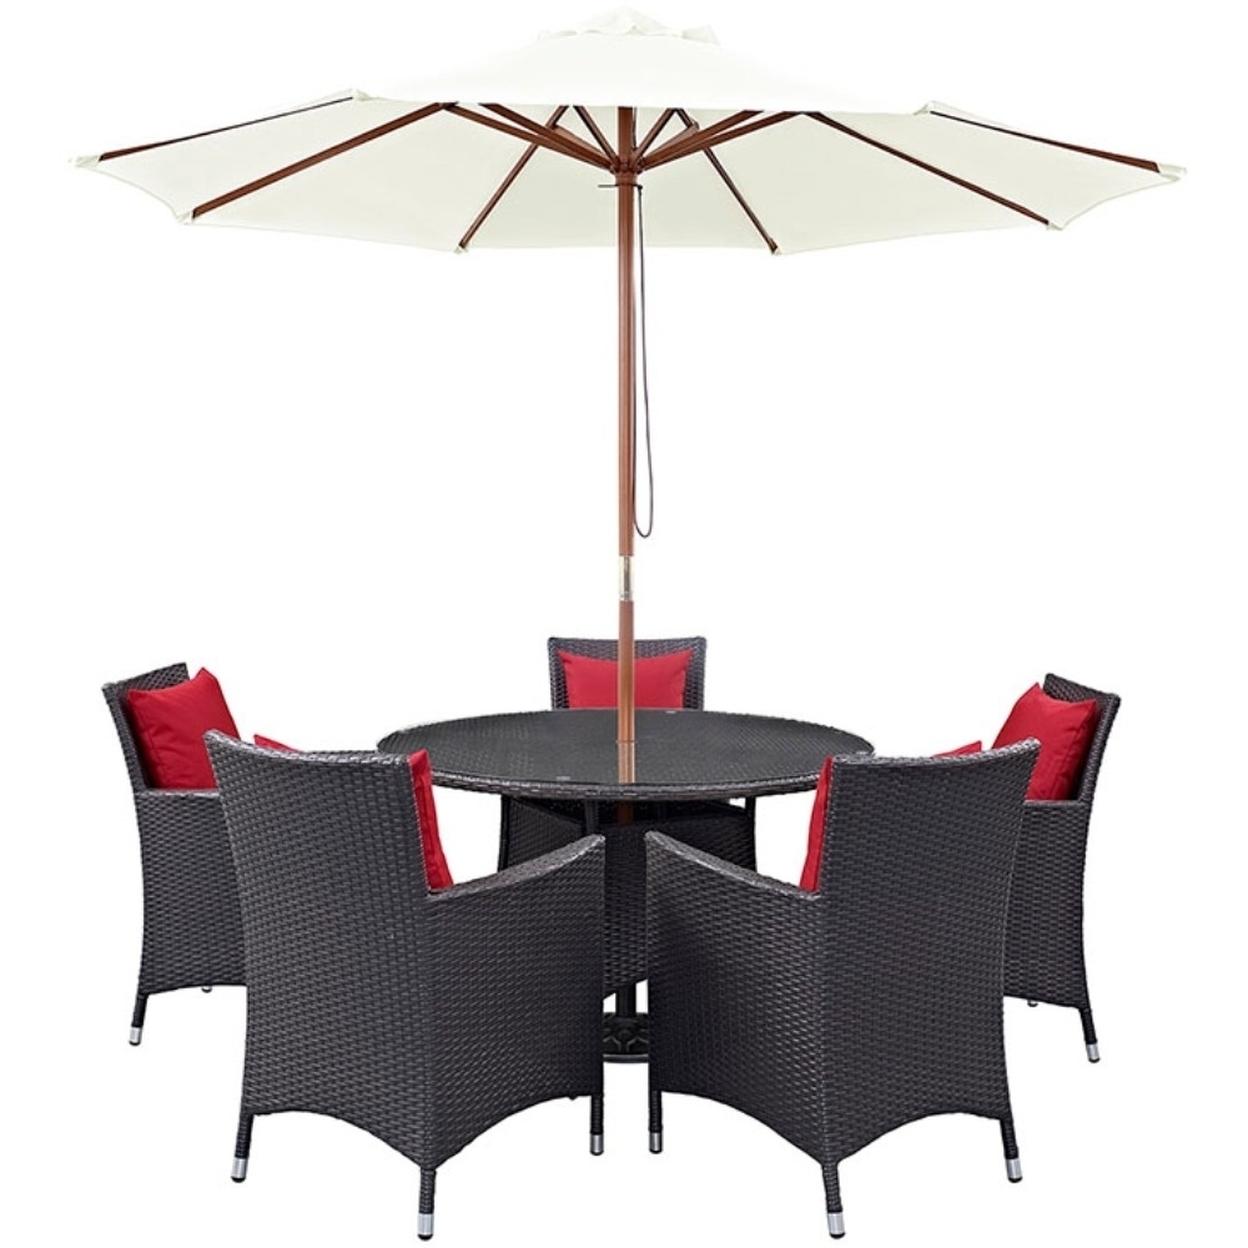 "Convene 7 Piece Outdoor Patio Dining Set, Espresso Red Size : 47\""lx47\""wx29\""h"